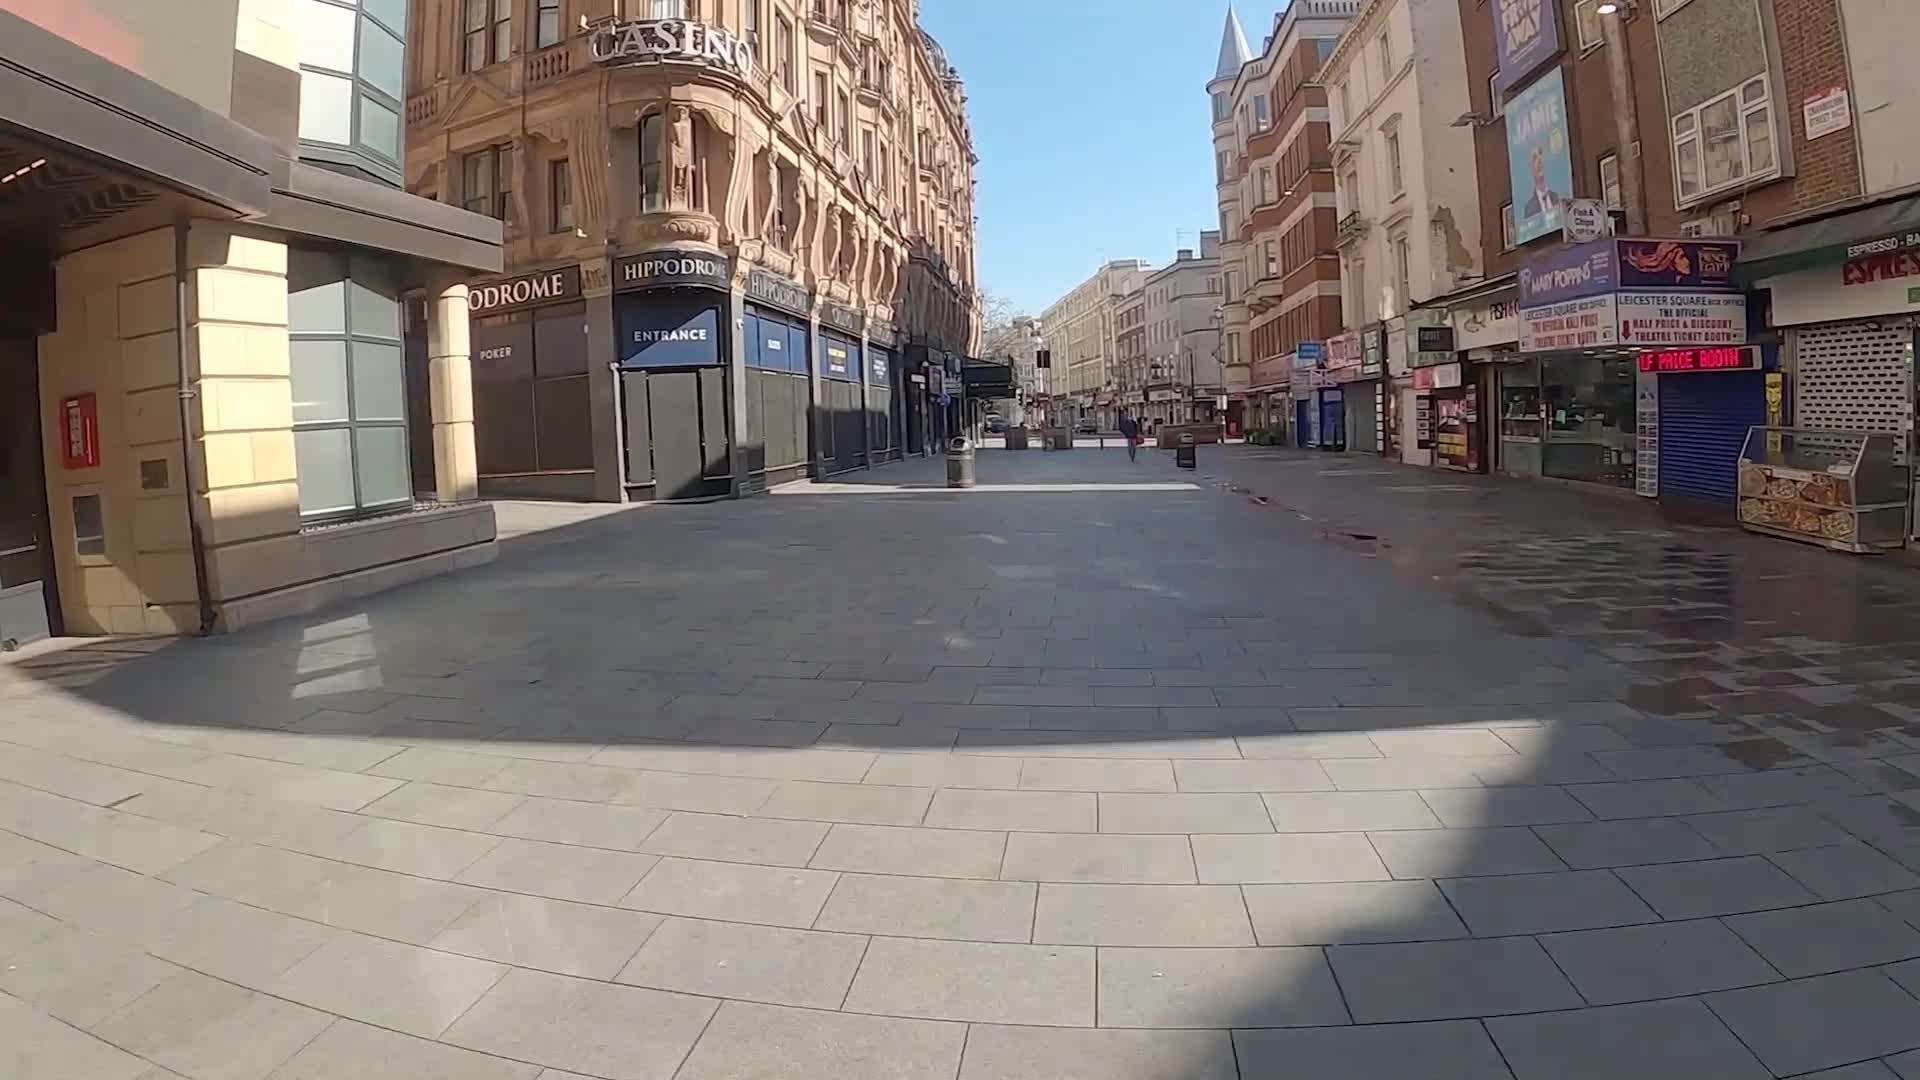 Journey through London's empty streets during coronavirus lockdown